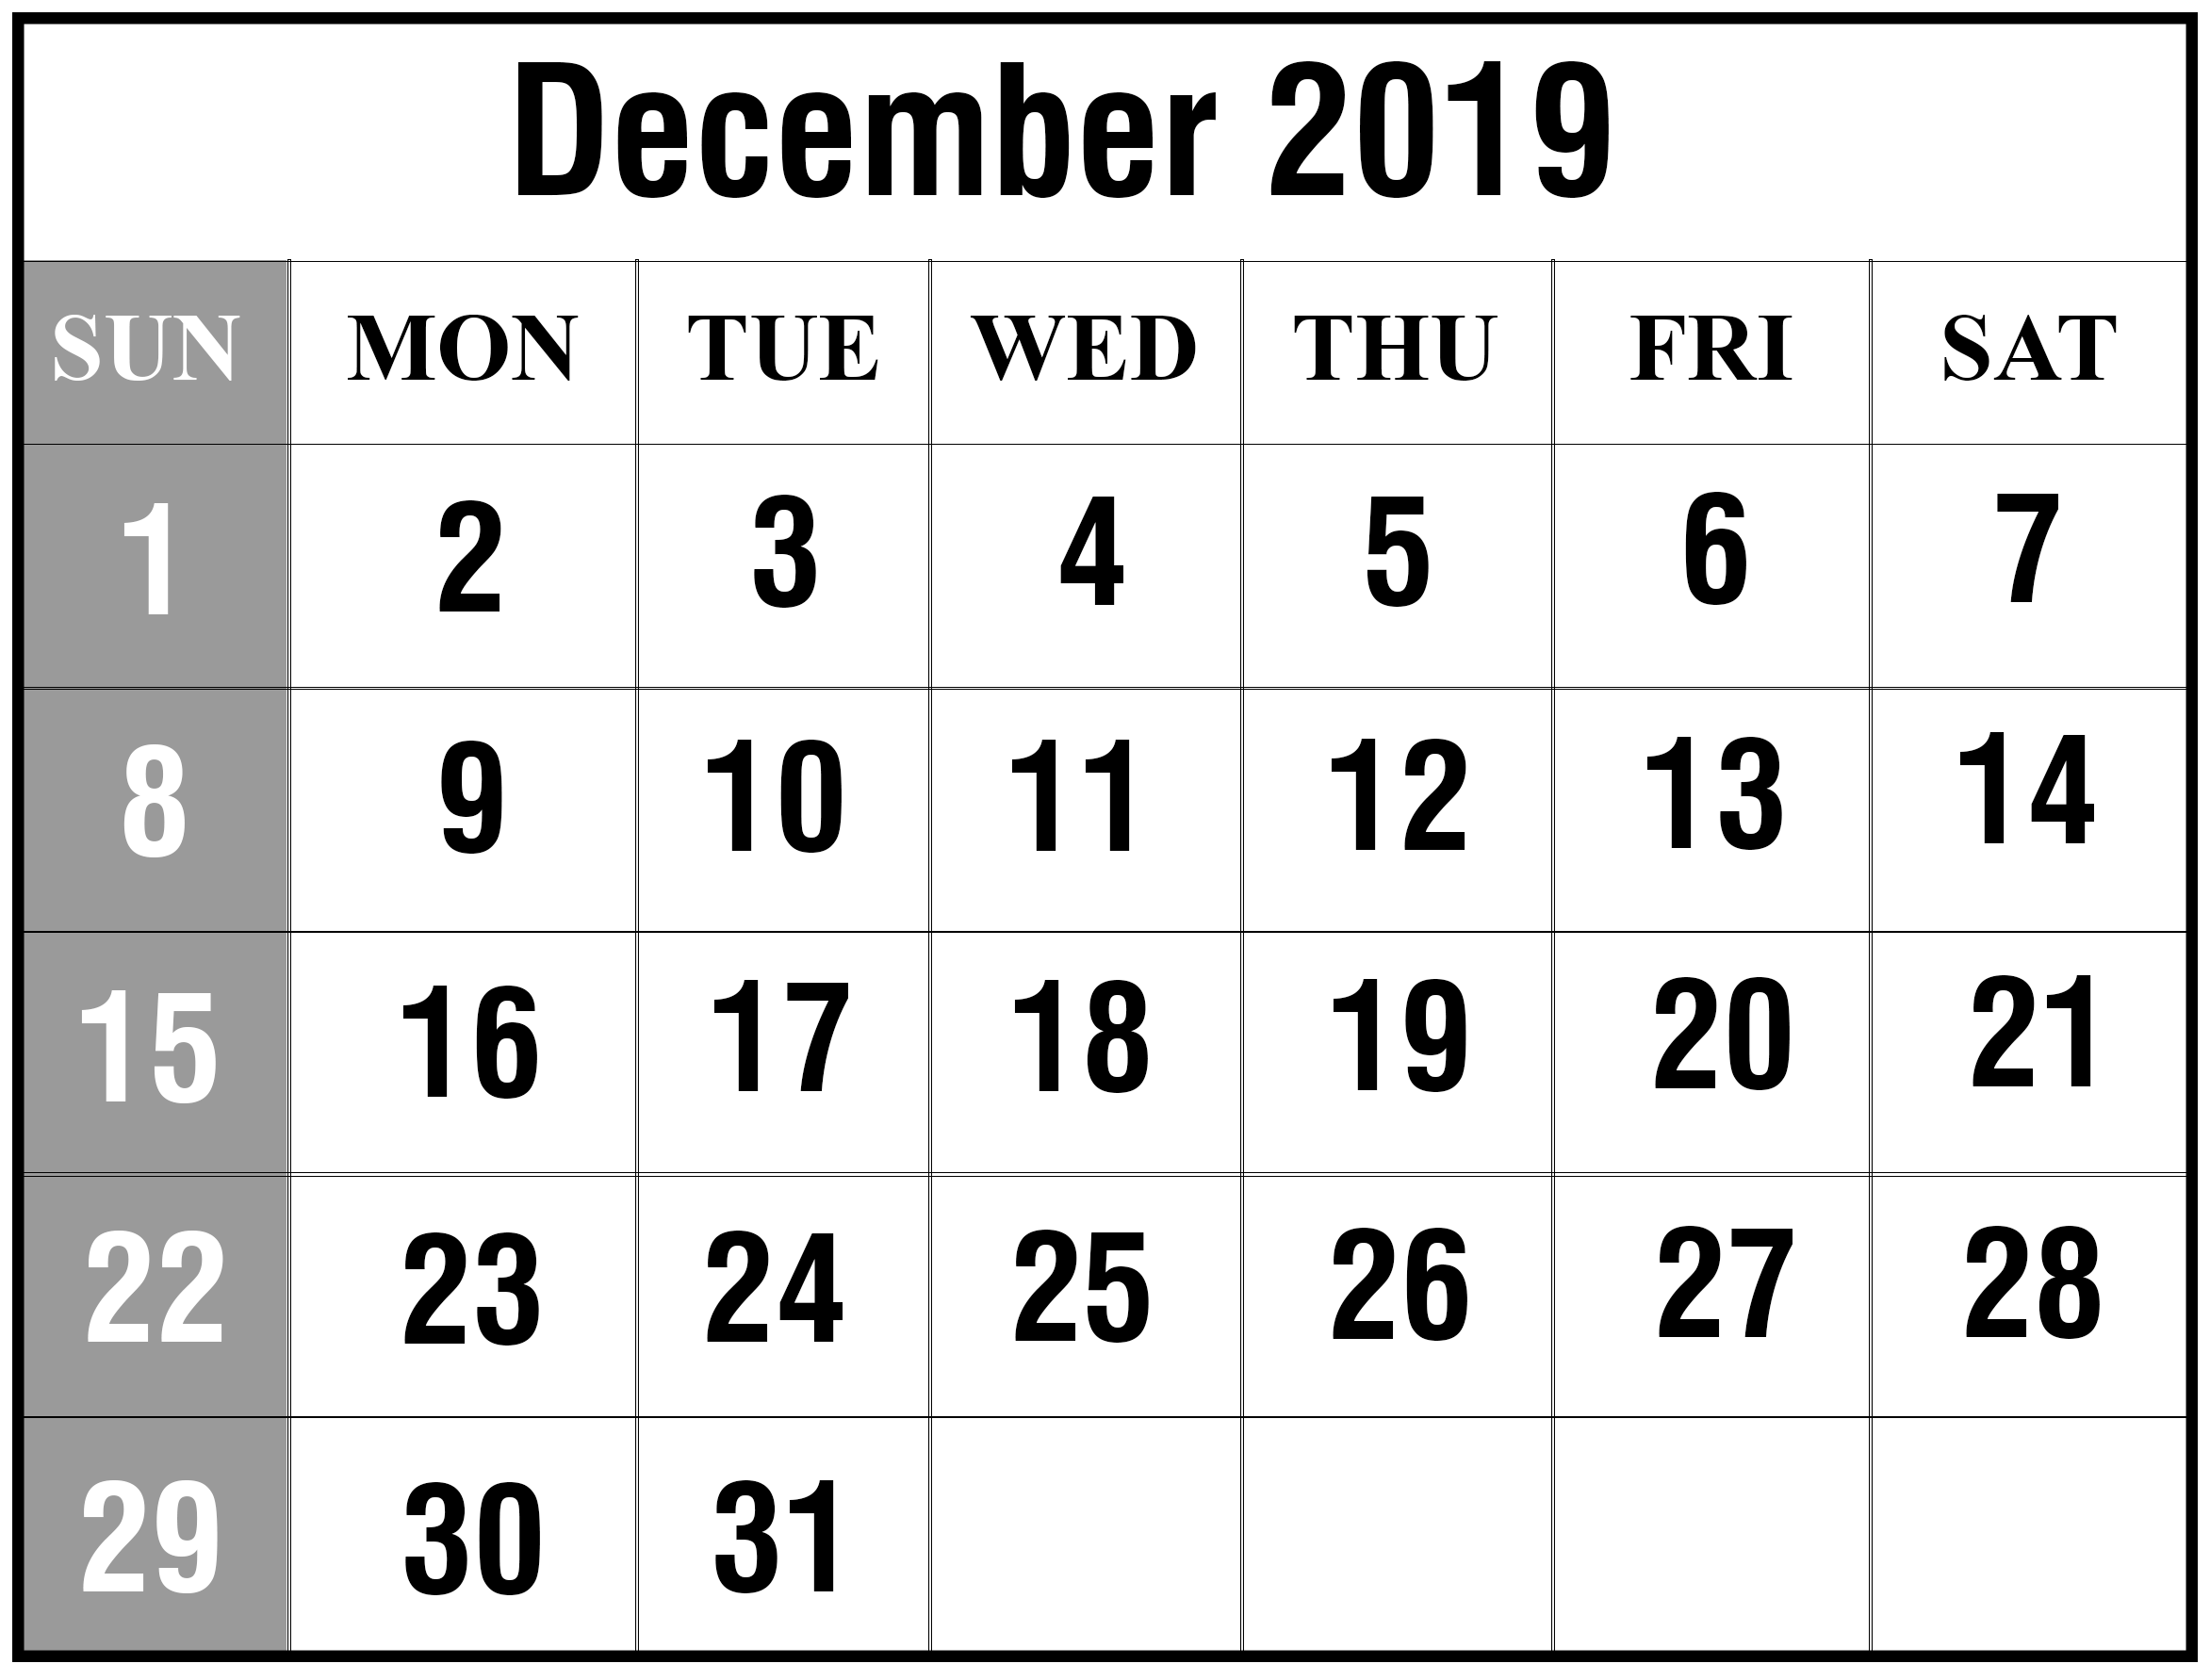 December Calendar Printable Dec December